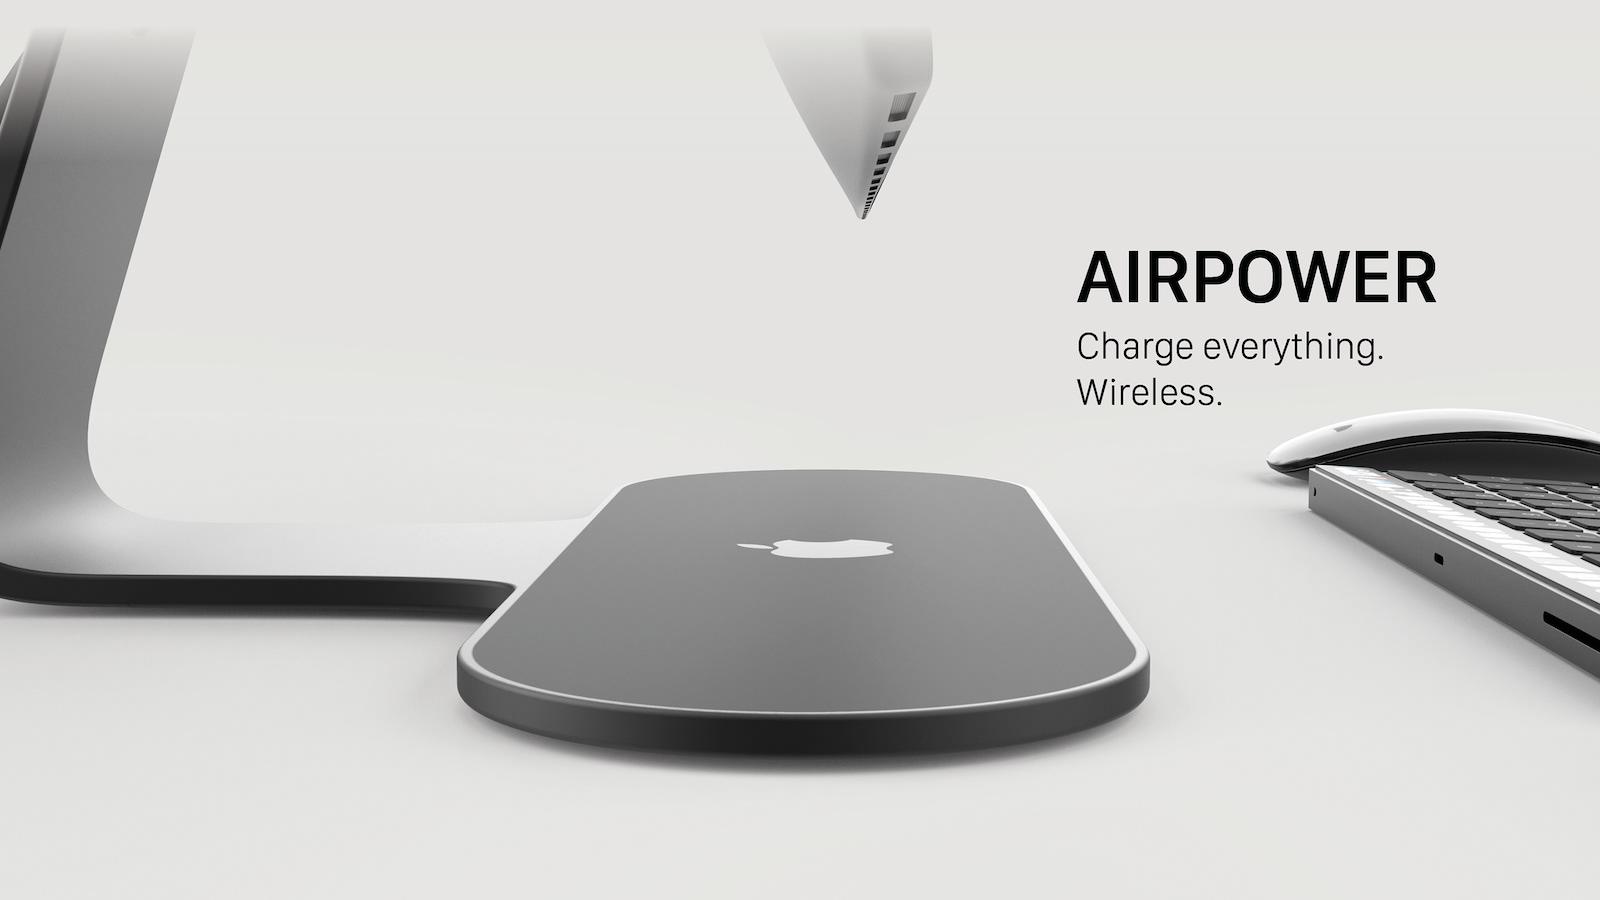 New iMac Concept 5